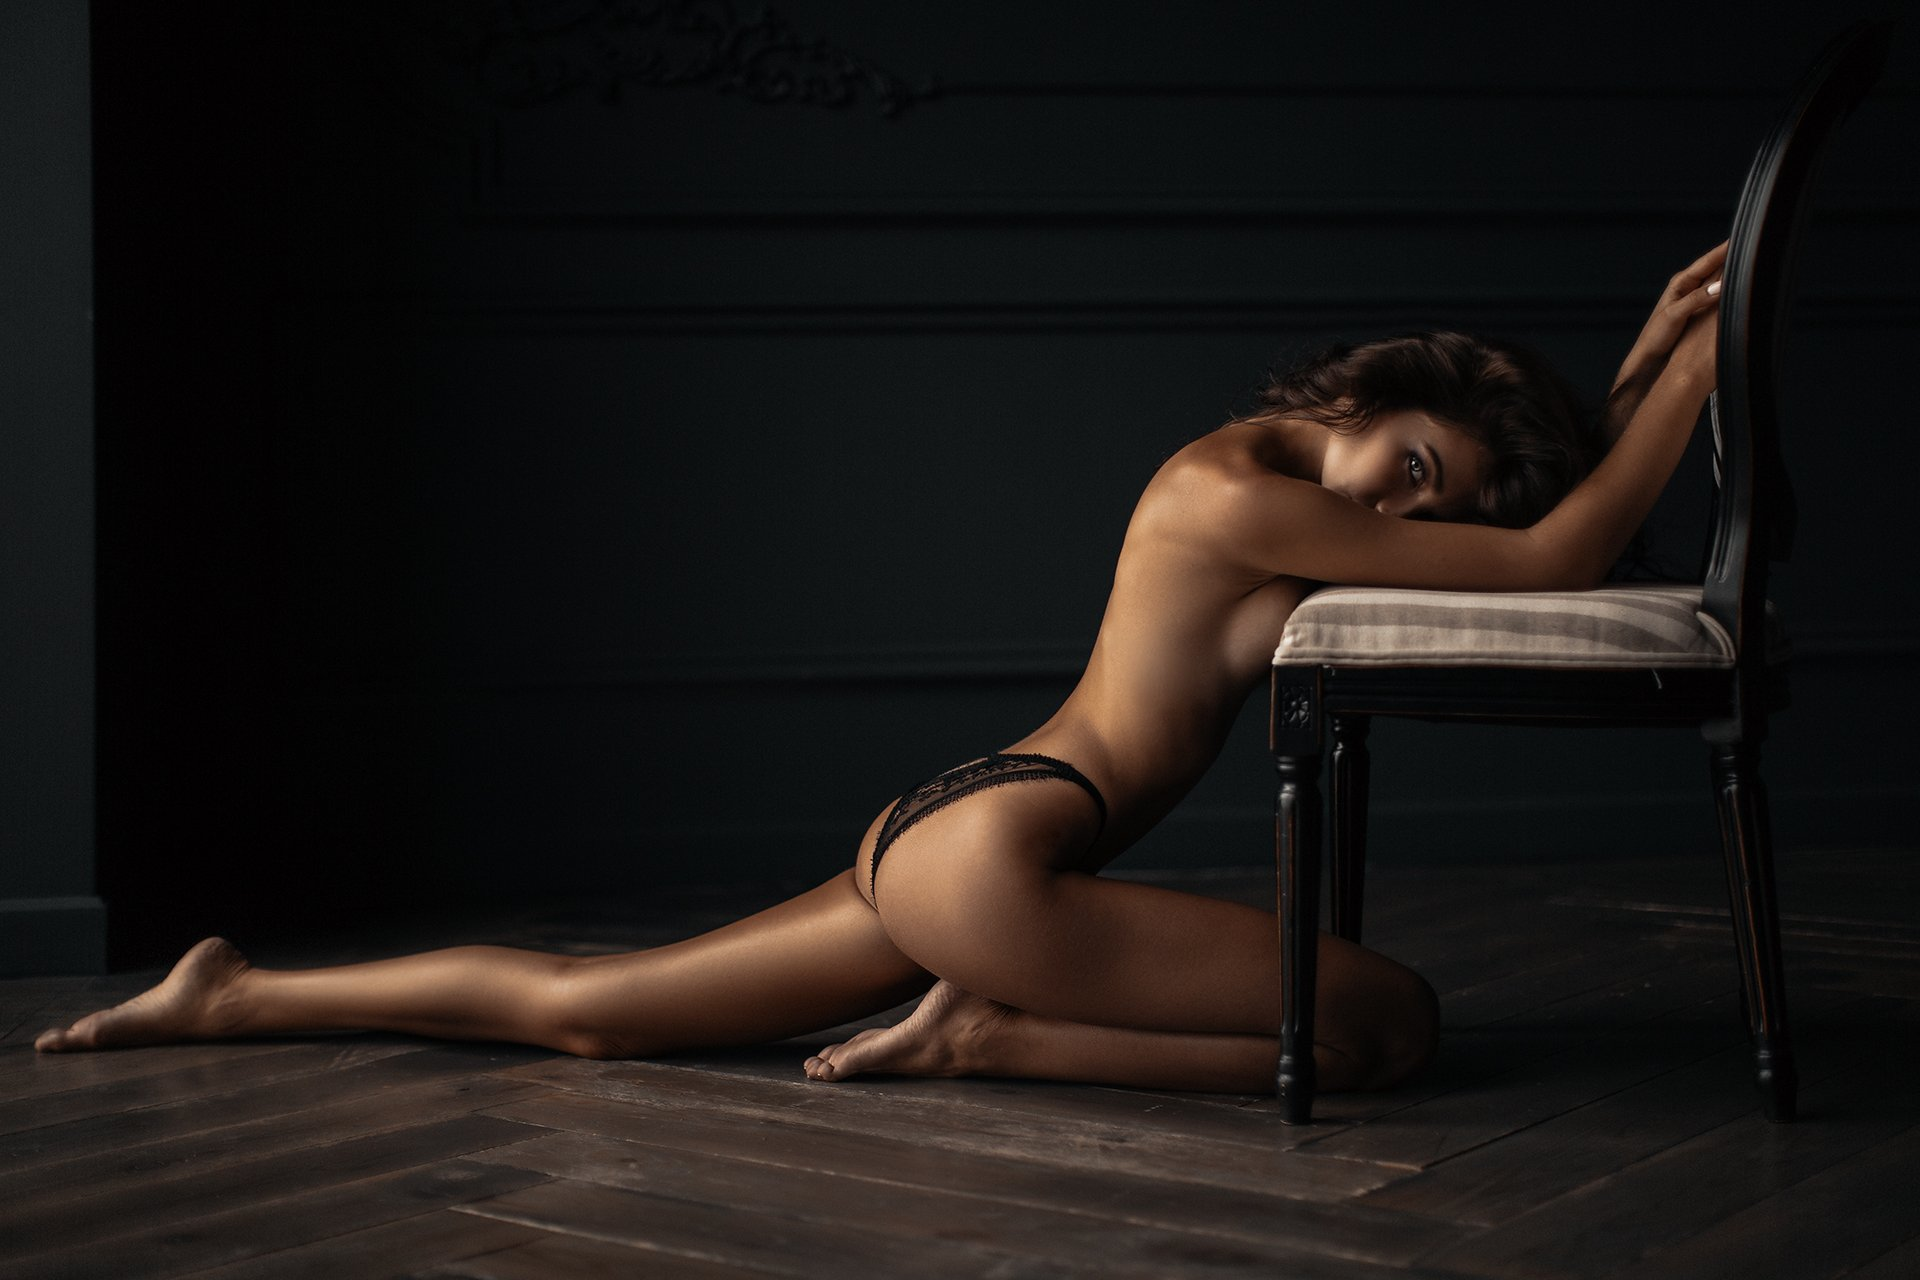 sexy, portrait, black, white, b&w, girl, hair, studio, light, beautiful, eyes, Востриков Сергей